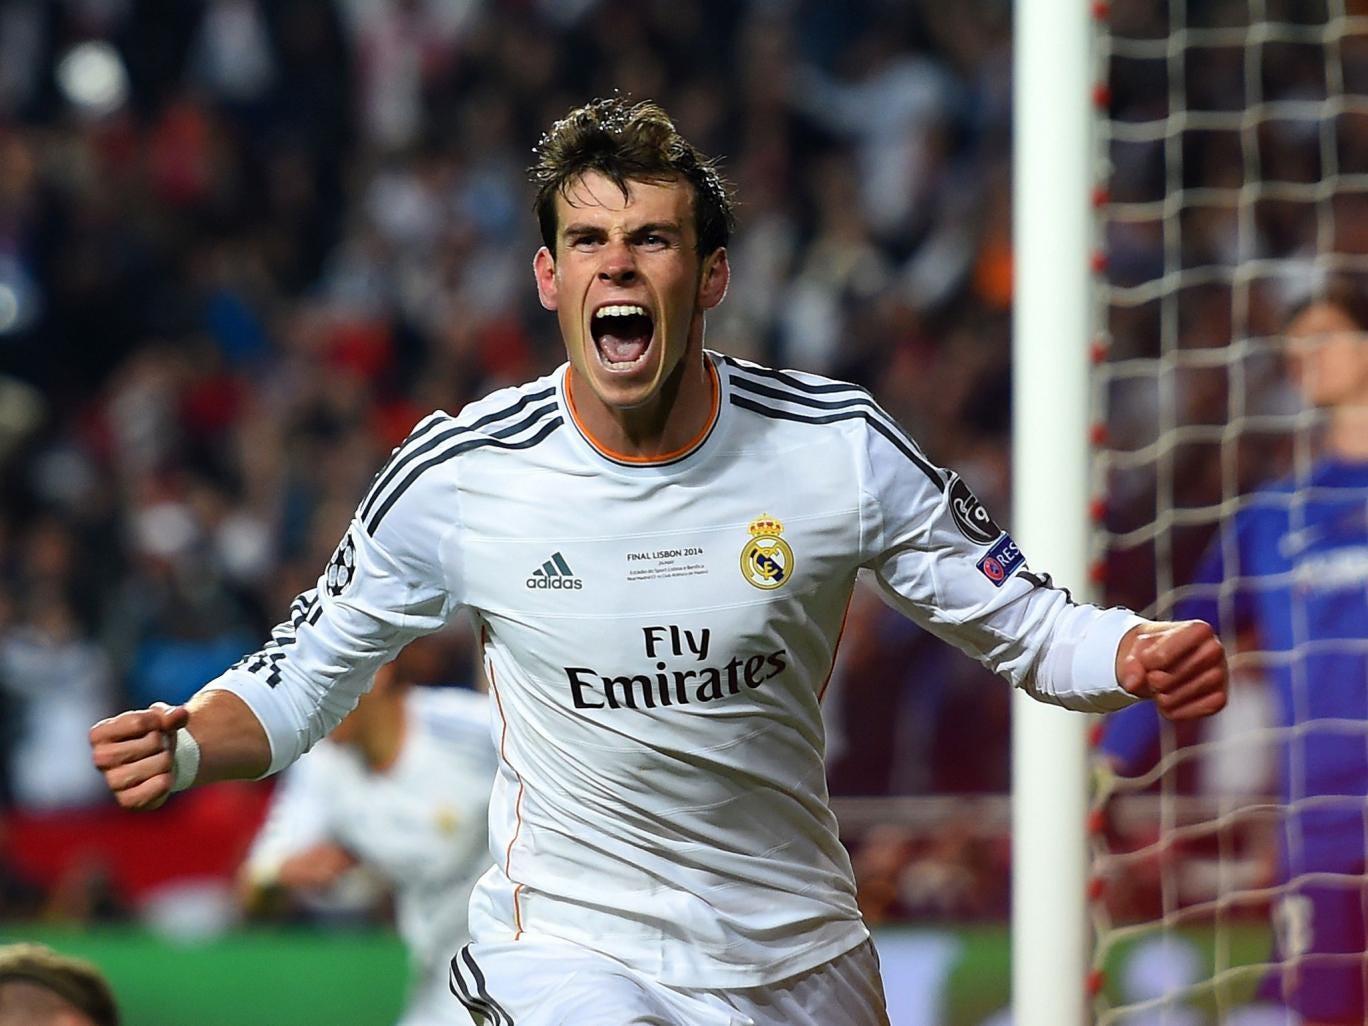 Gareth Bale celebrates after scoring the vital goal for Real Madrid